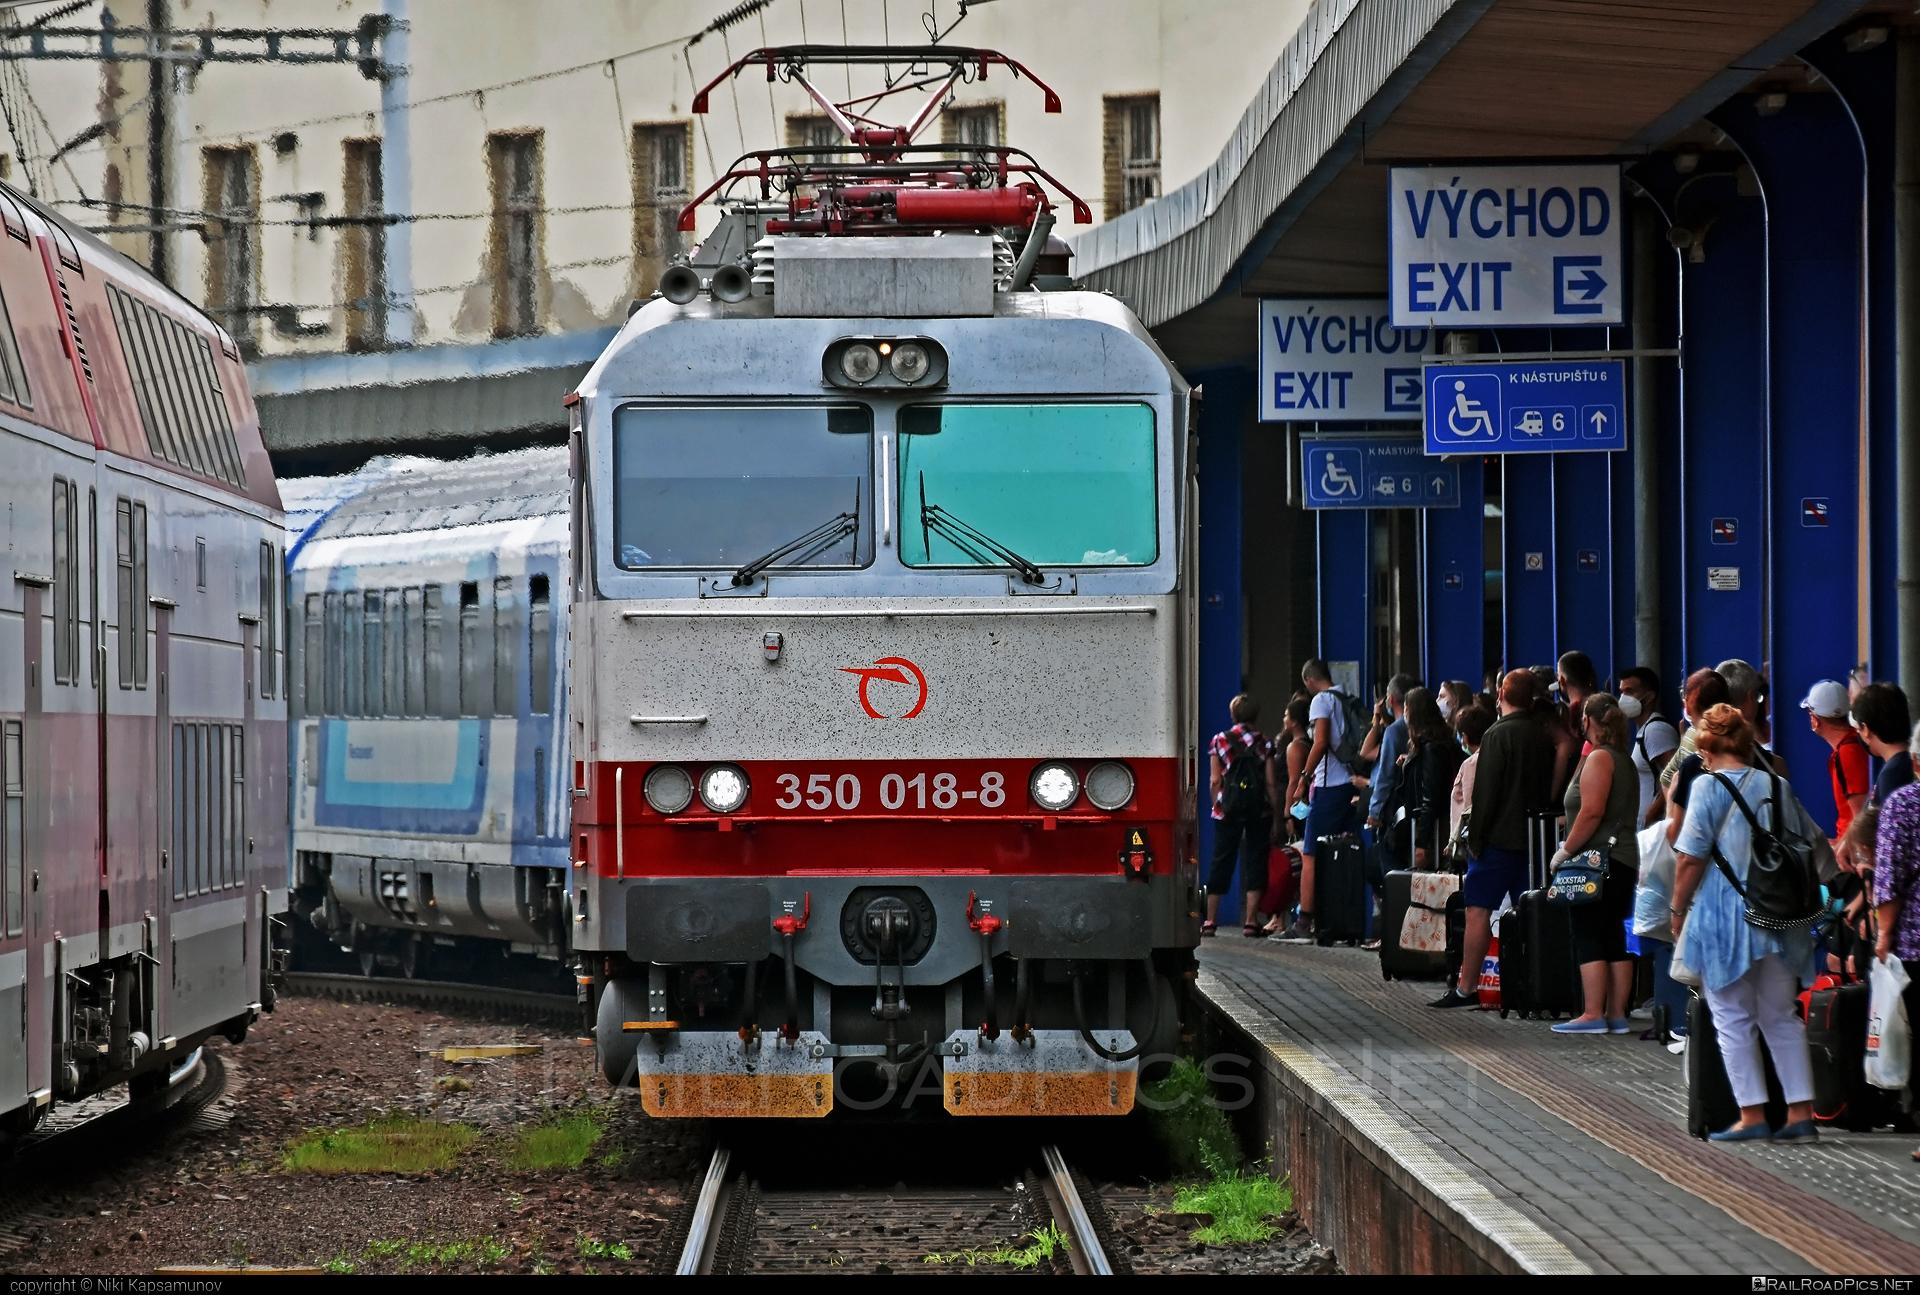 Škoda 55E - 350 018-8 operated by Železničná Spoločnost' Slovensko, a.s. #ZeleznicnaSpolocnostSlovensko #gorila #locomotive350 #skoda #skoda55e #zssk